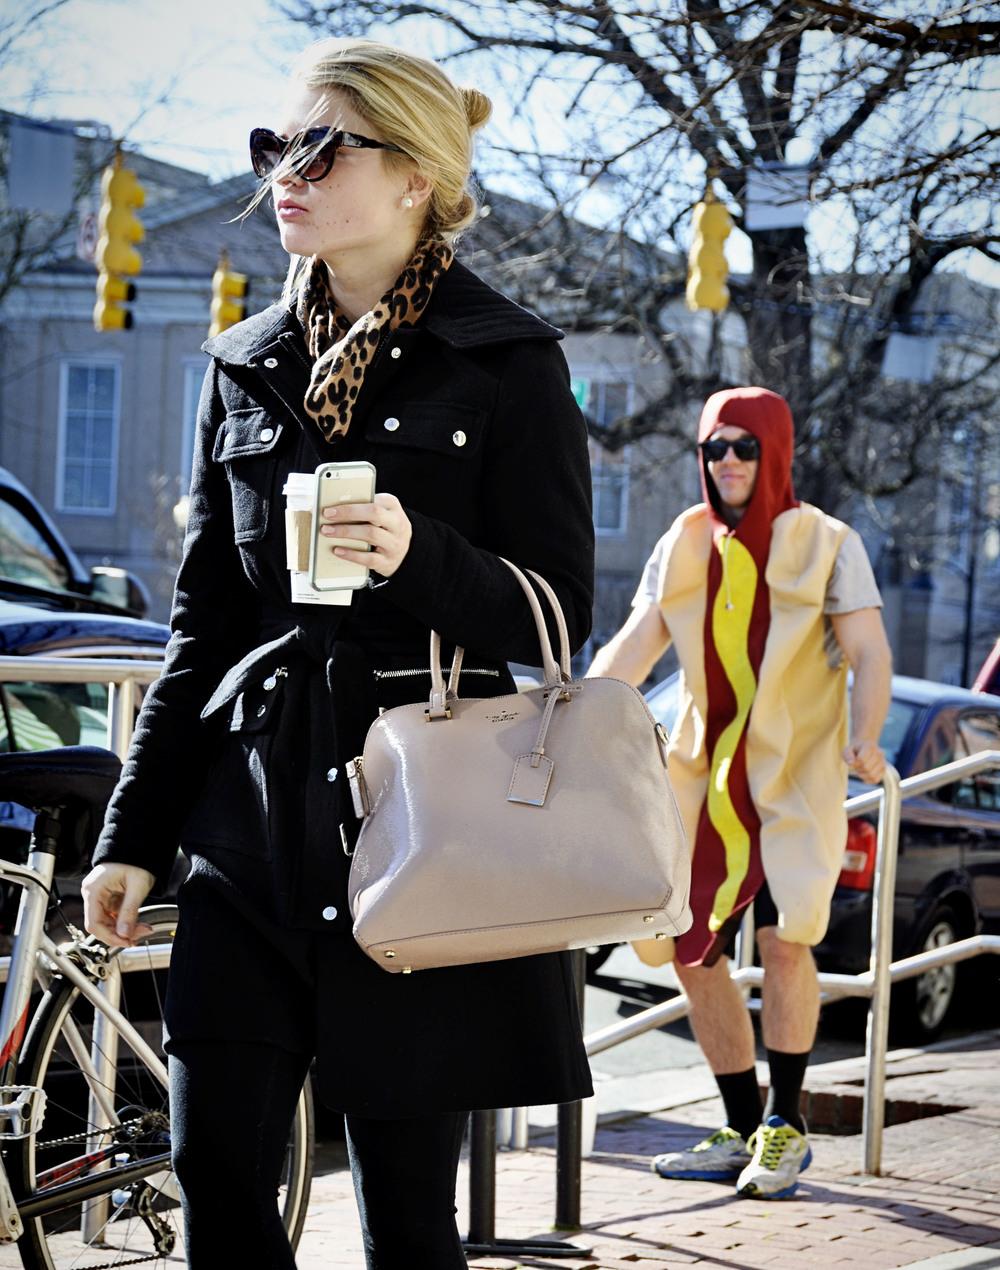 hotdog6-1.jpg